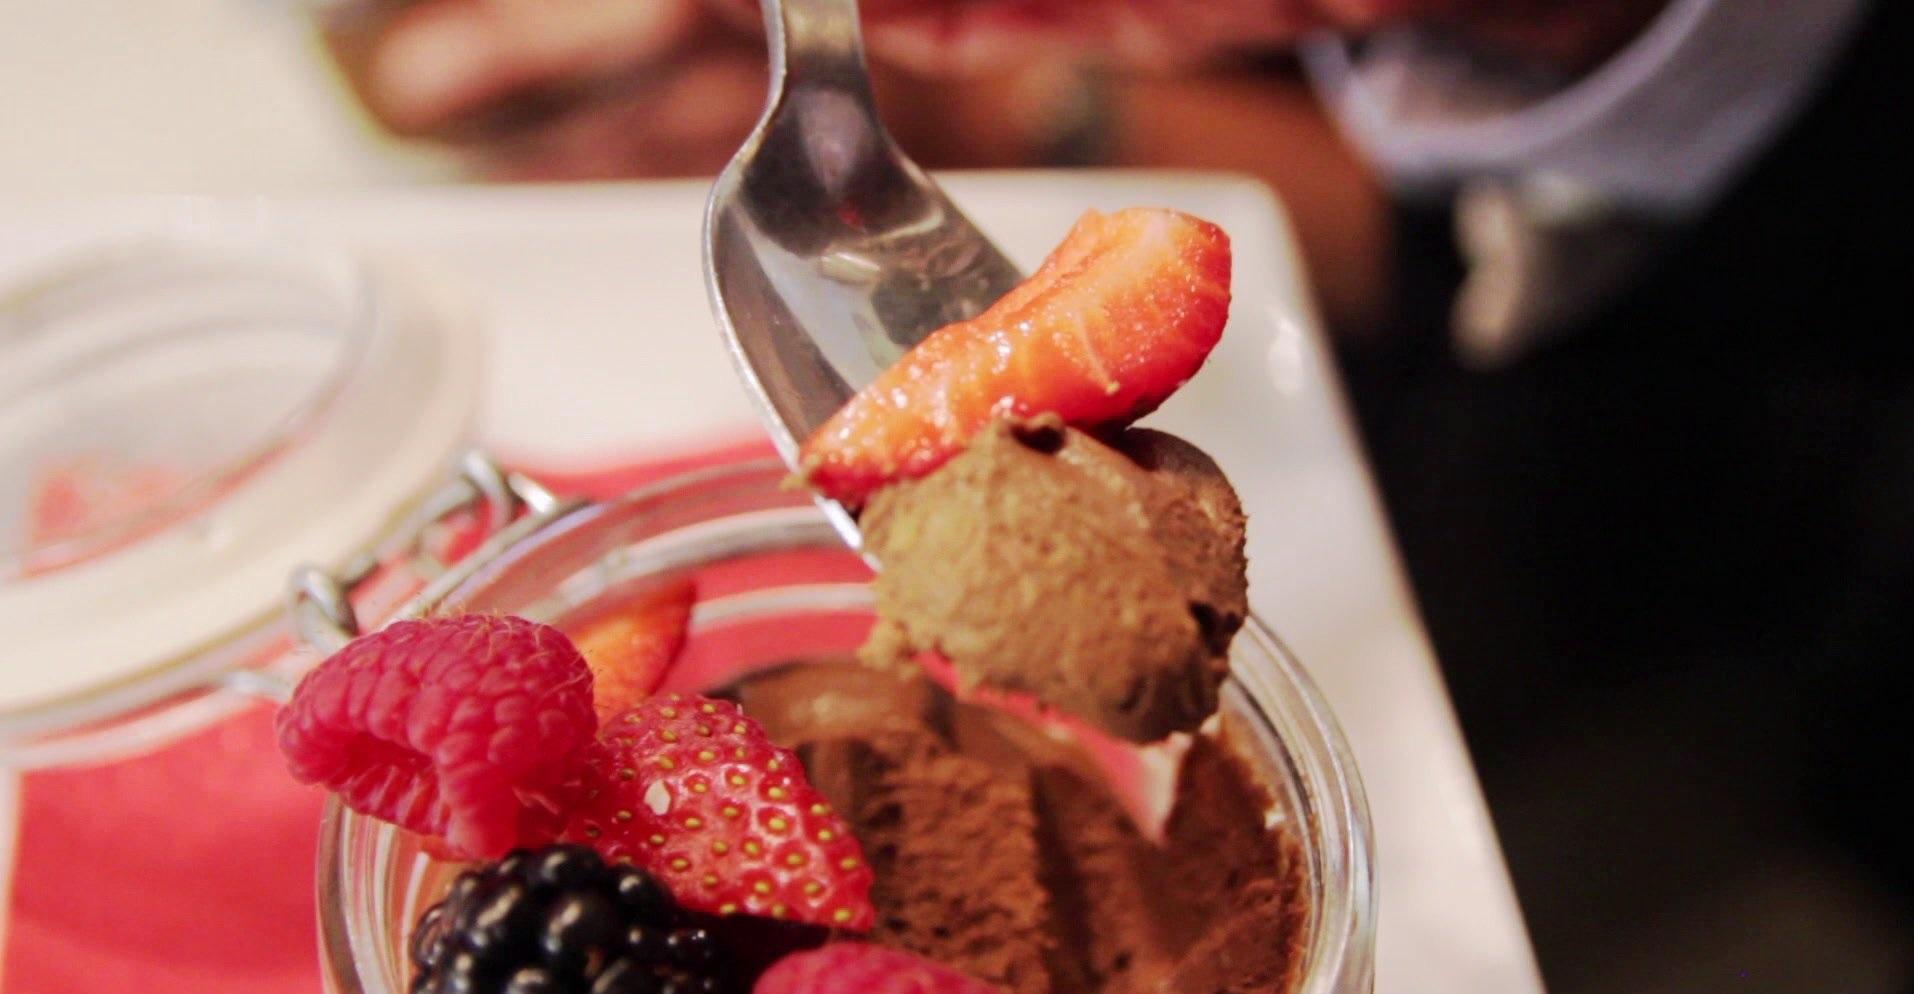 Chef Uno Makes Chocolate Avocado Mousse